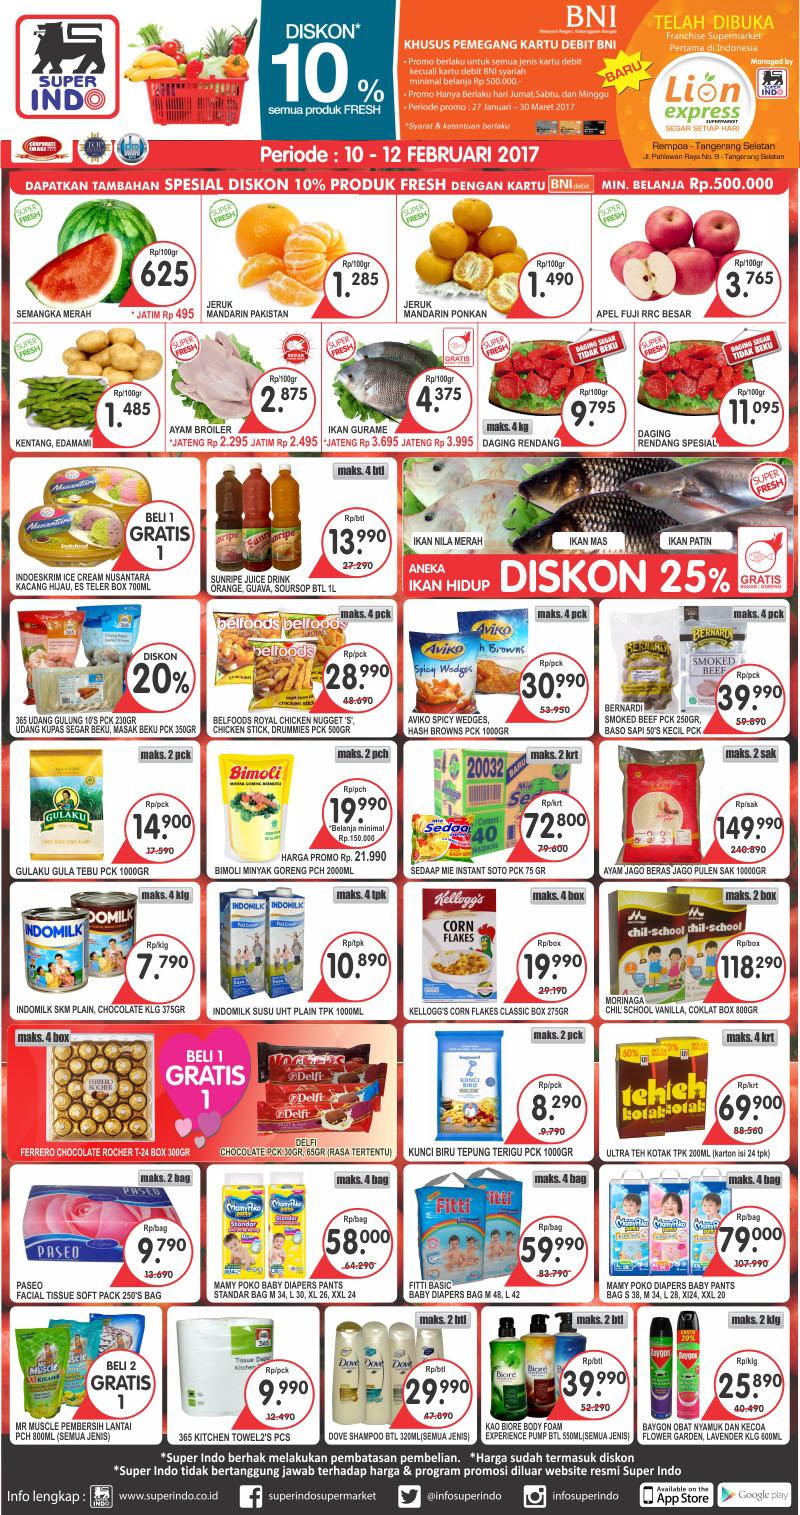 Katalog Promo Weekend Koran Superindo 10 12 Februari 2017